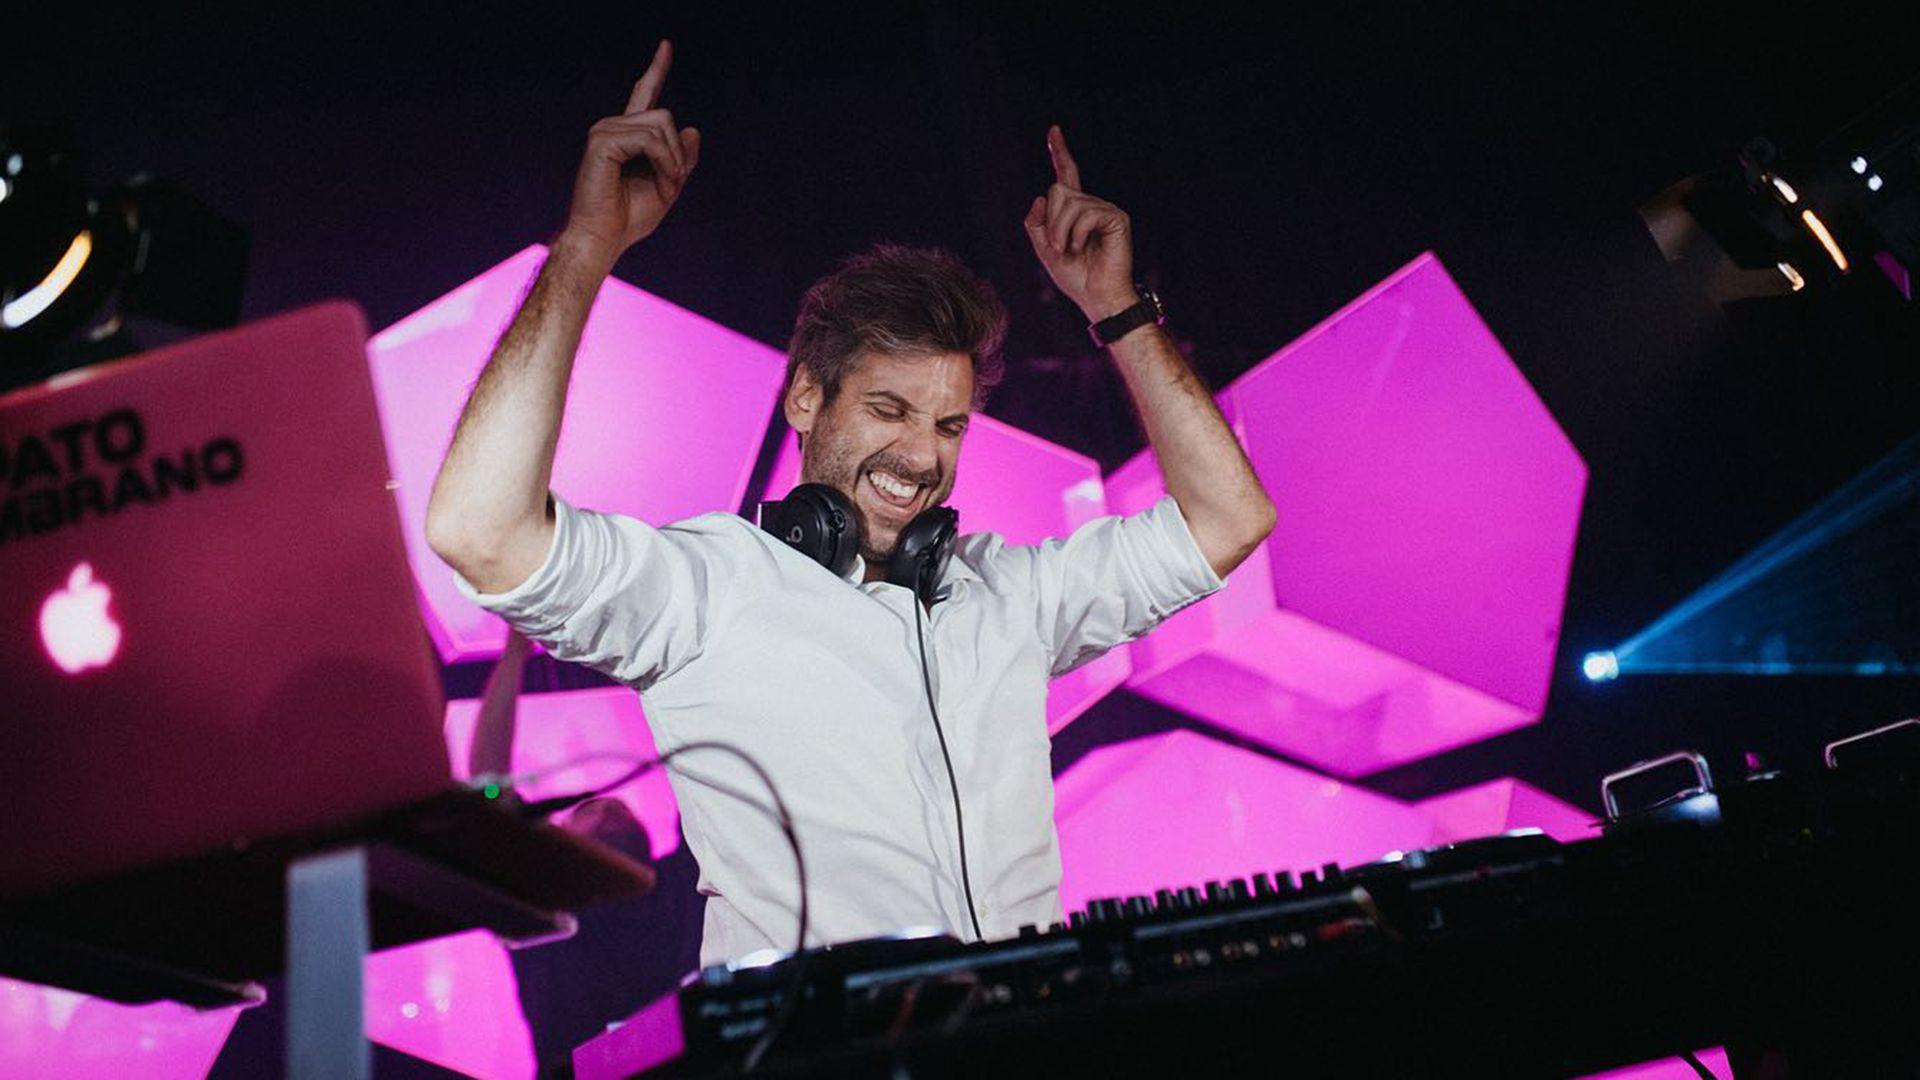 Denunciaron a un DJ de Recoleta por ruidos molestos